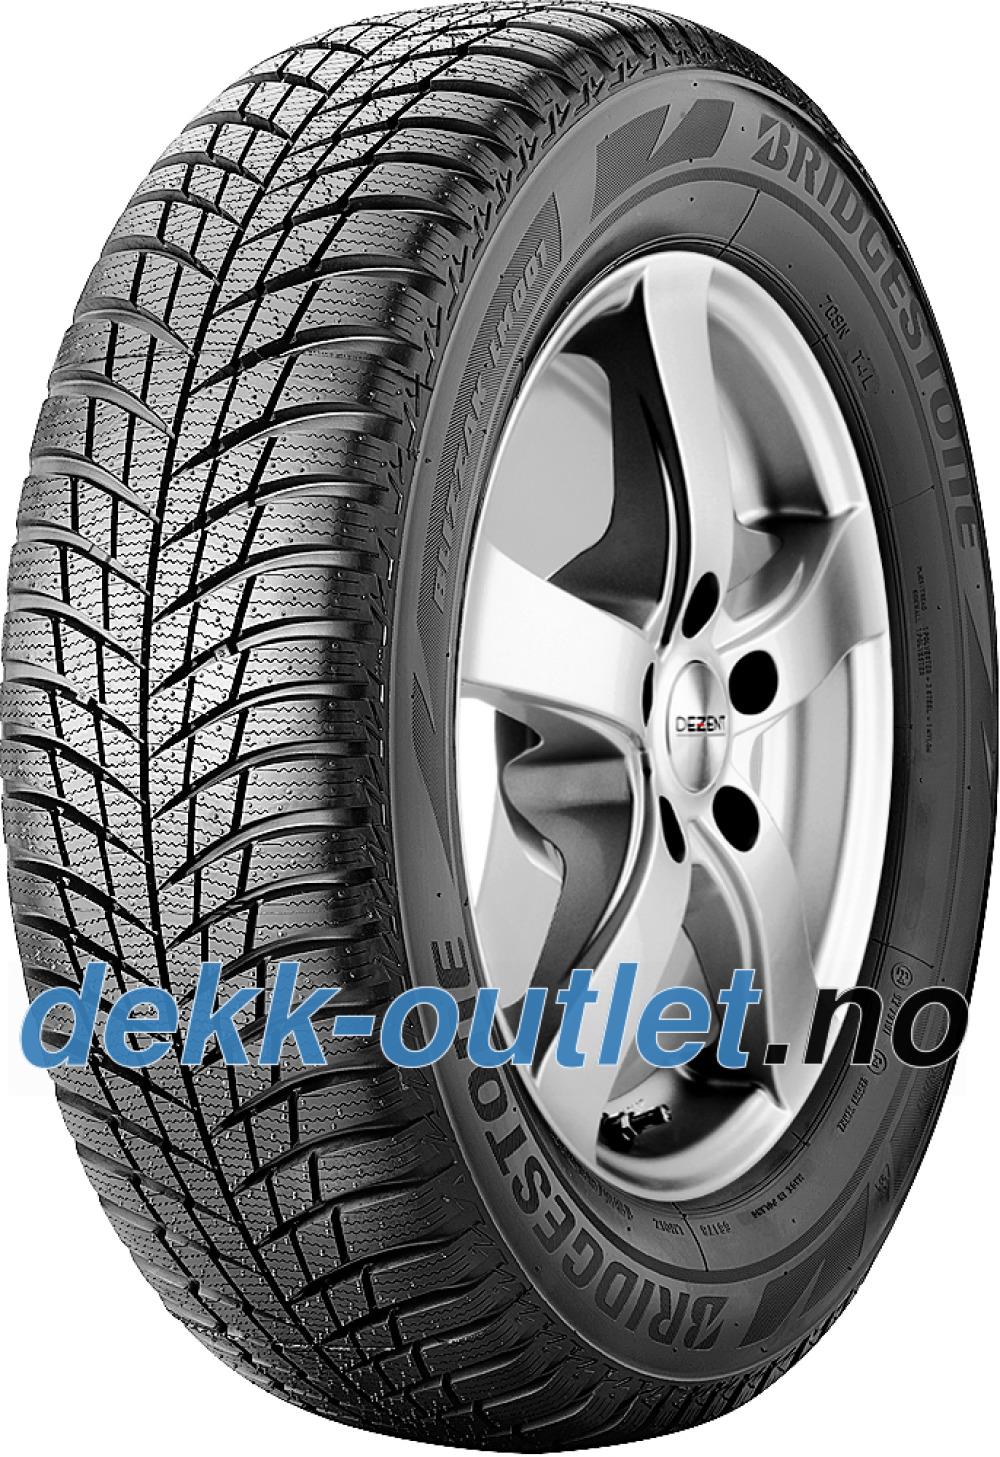 Bridgestone Blizzak LM 001 ( 225/45 R18 95V XL , med felgbeskyttelse (MFS) )